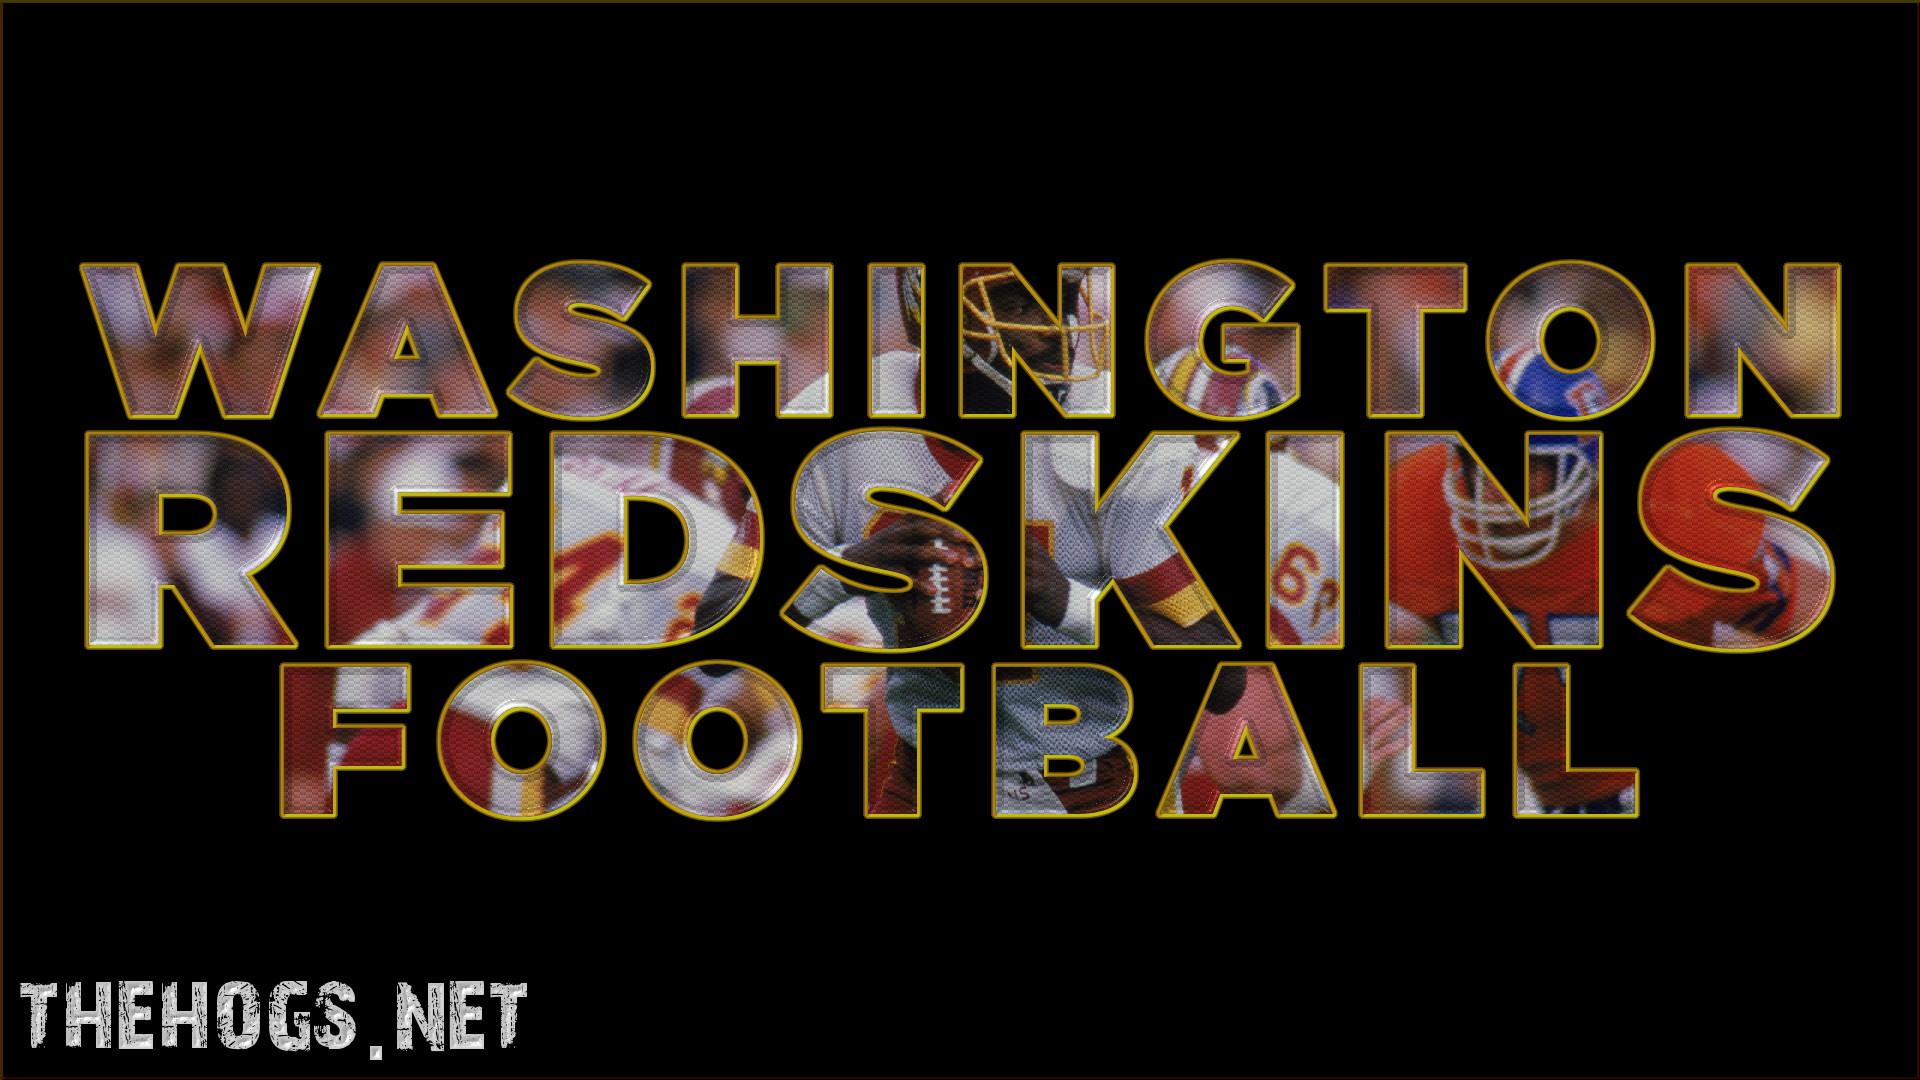 Sean taylor wallpapers 57 images - Redskins wallpaper phone ...